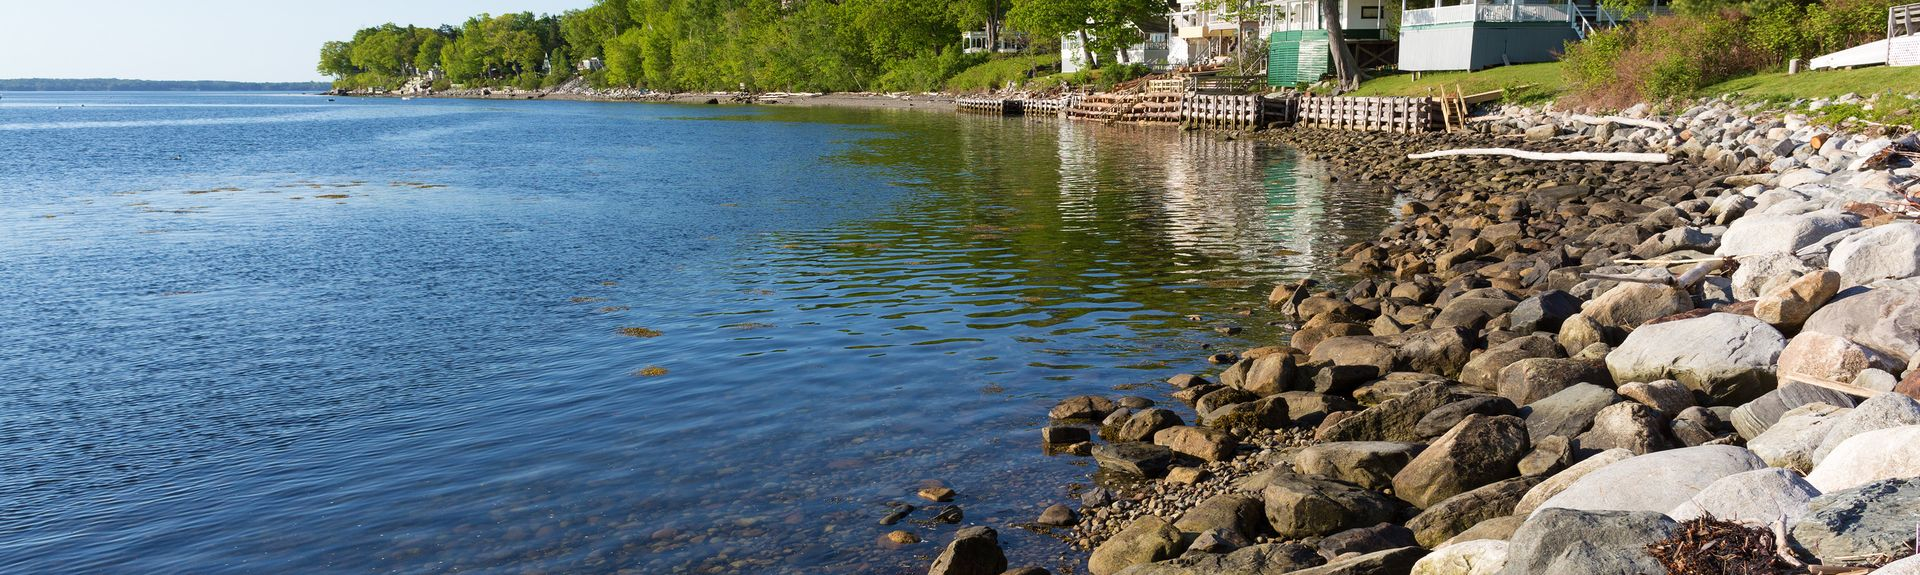 Northport, Maine, Stati Uniti d'America